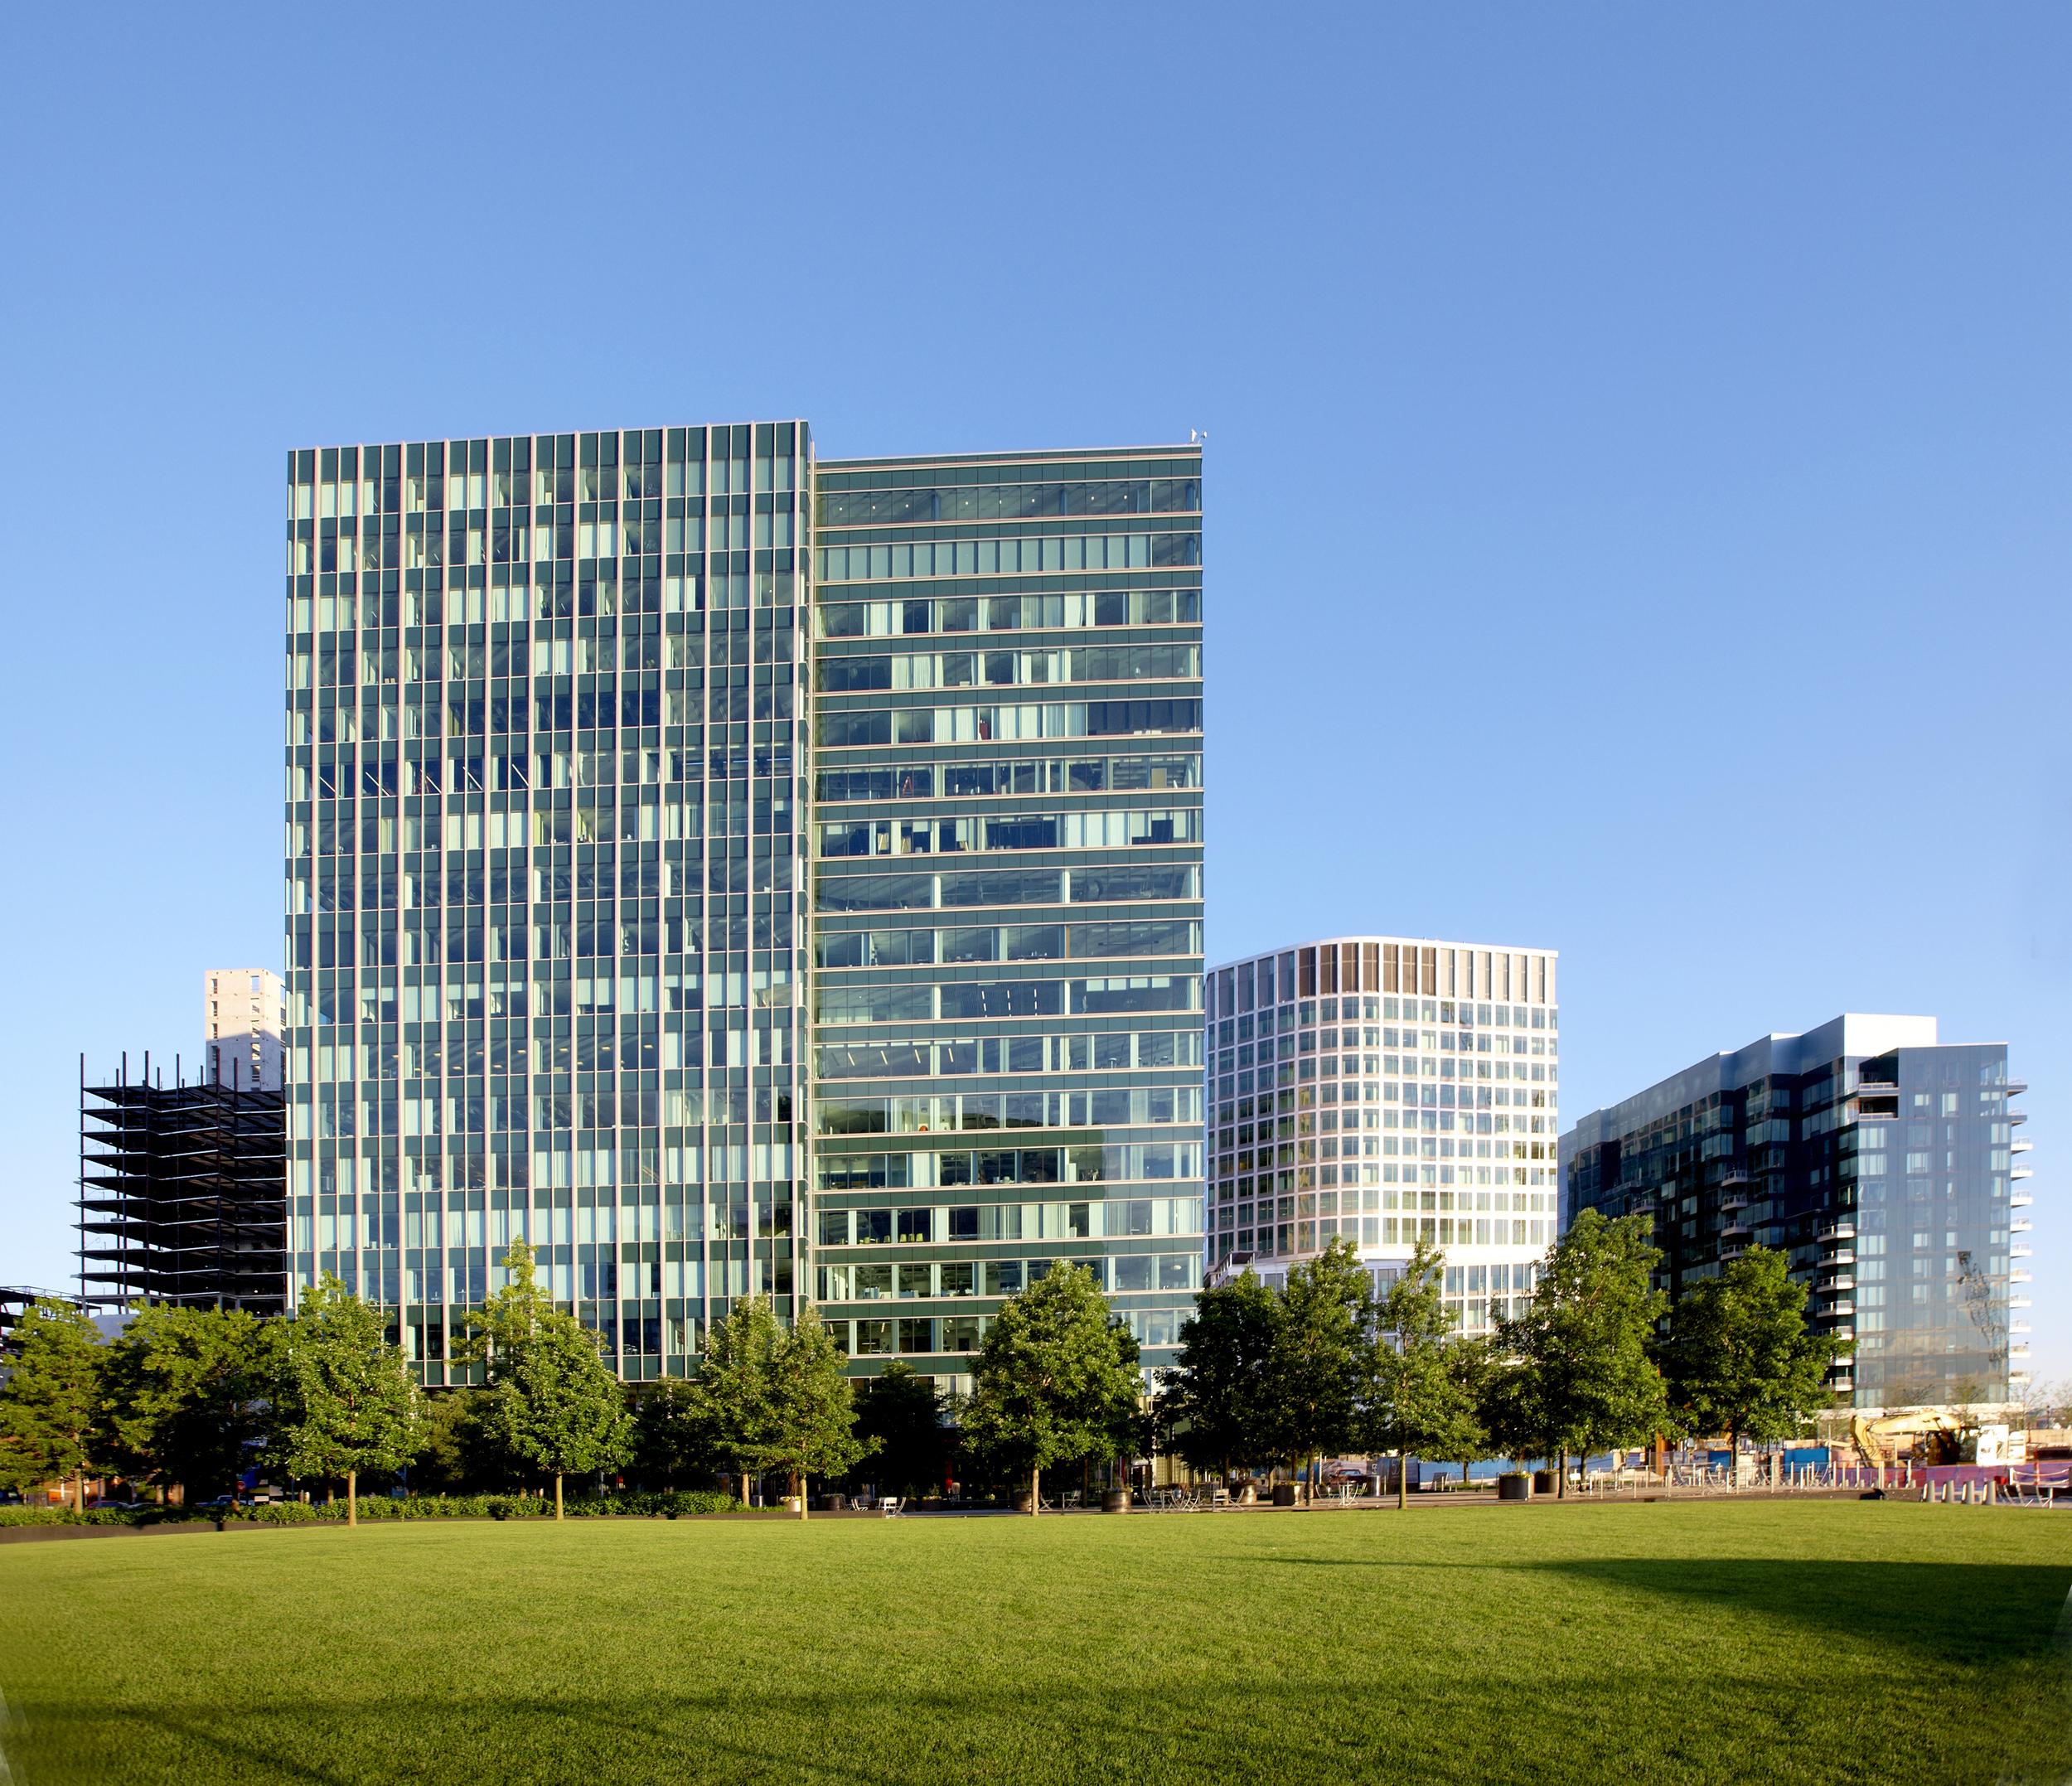 Boston tall building 7.jpg